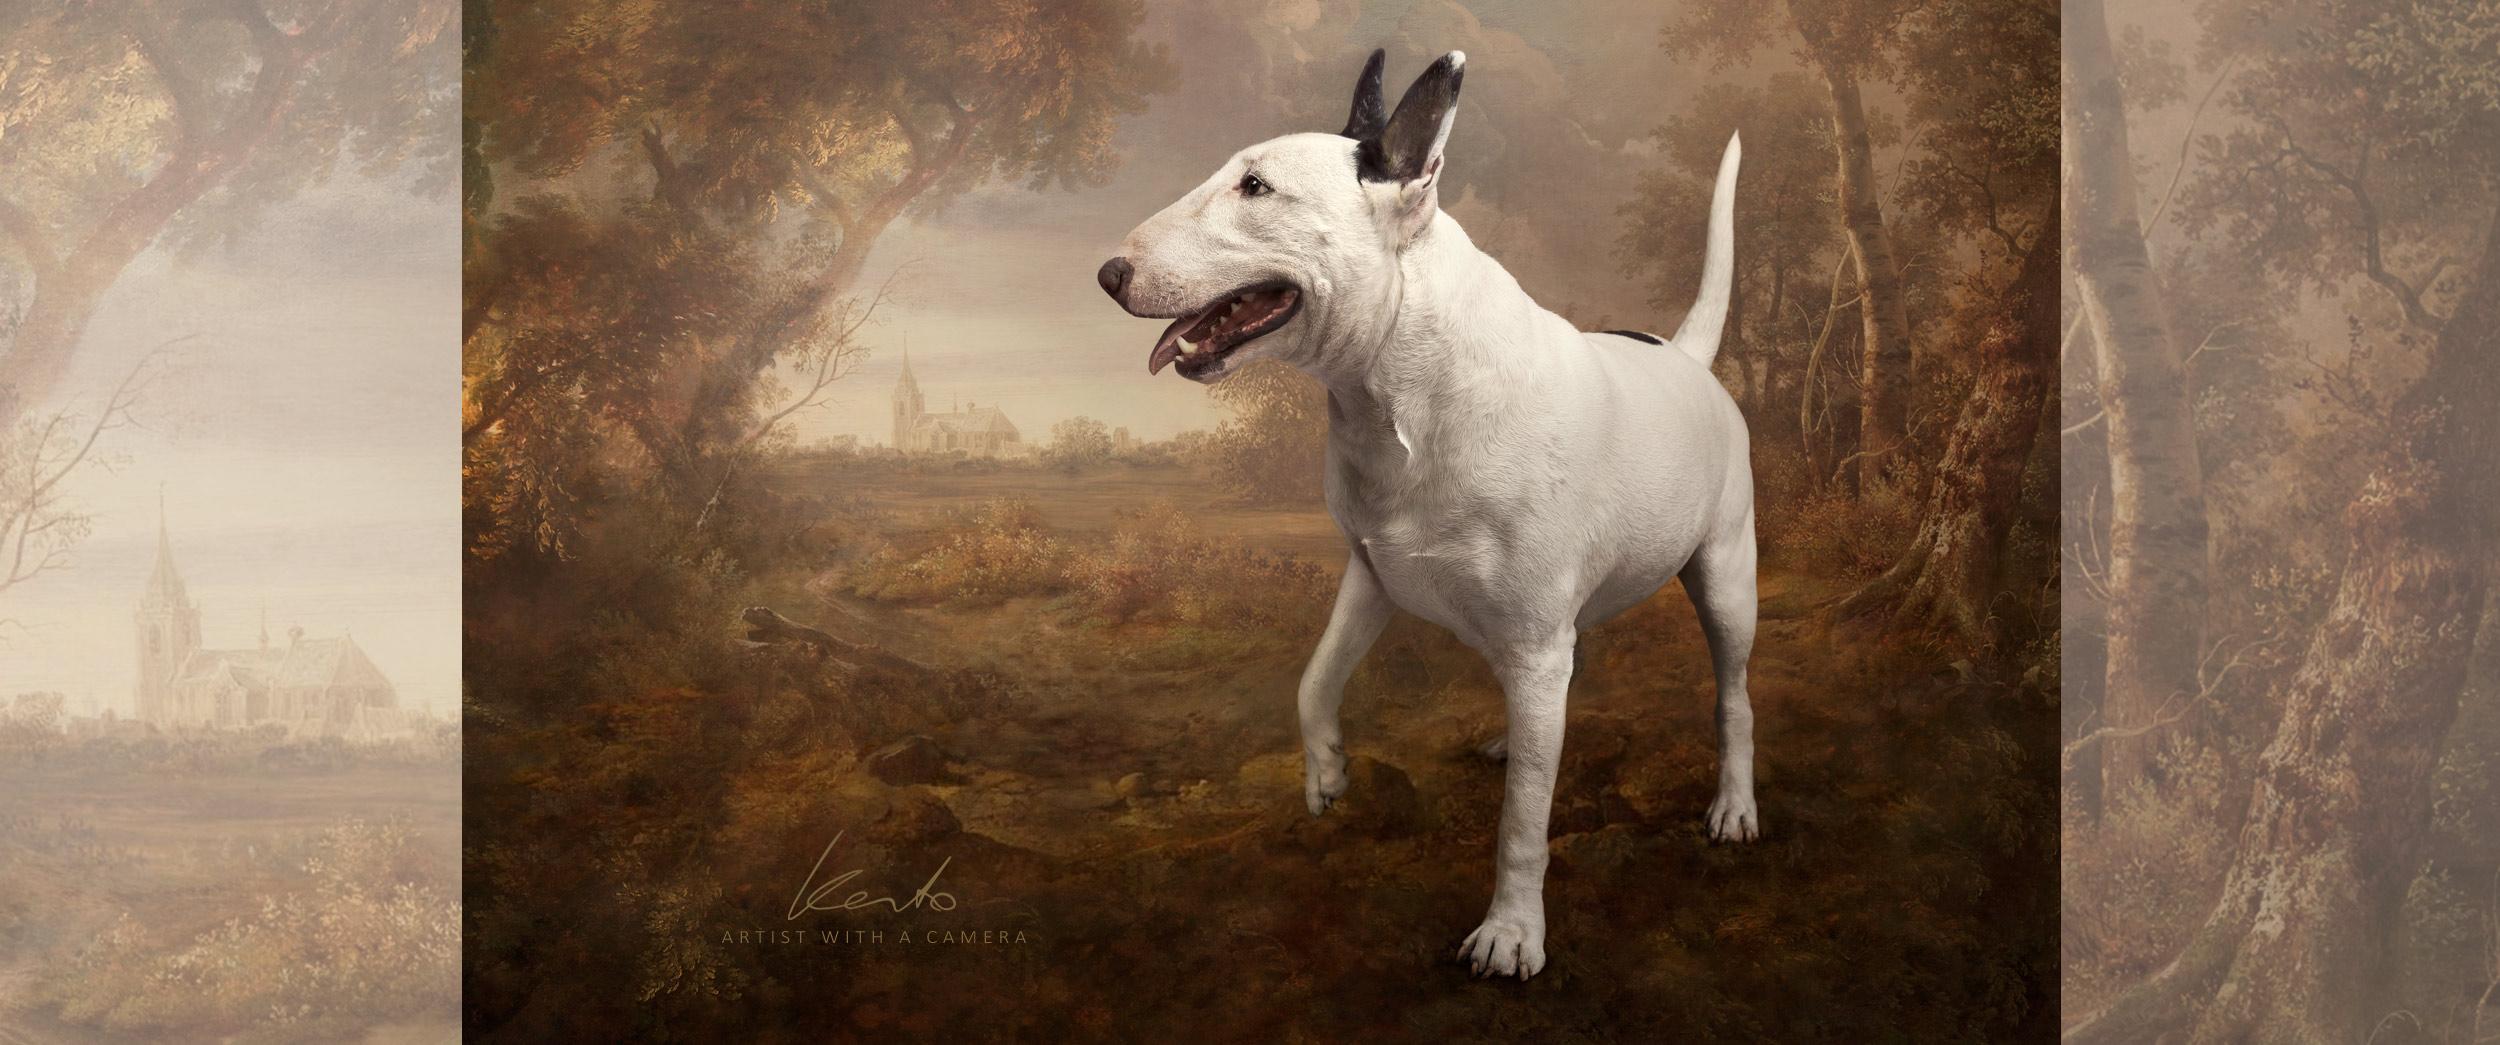 Fine art dog photography